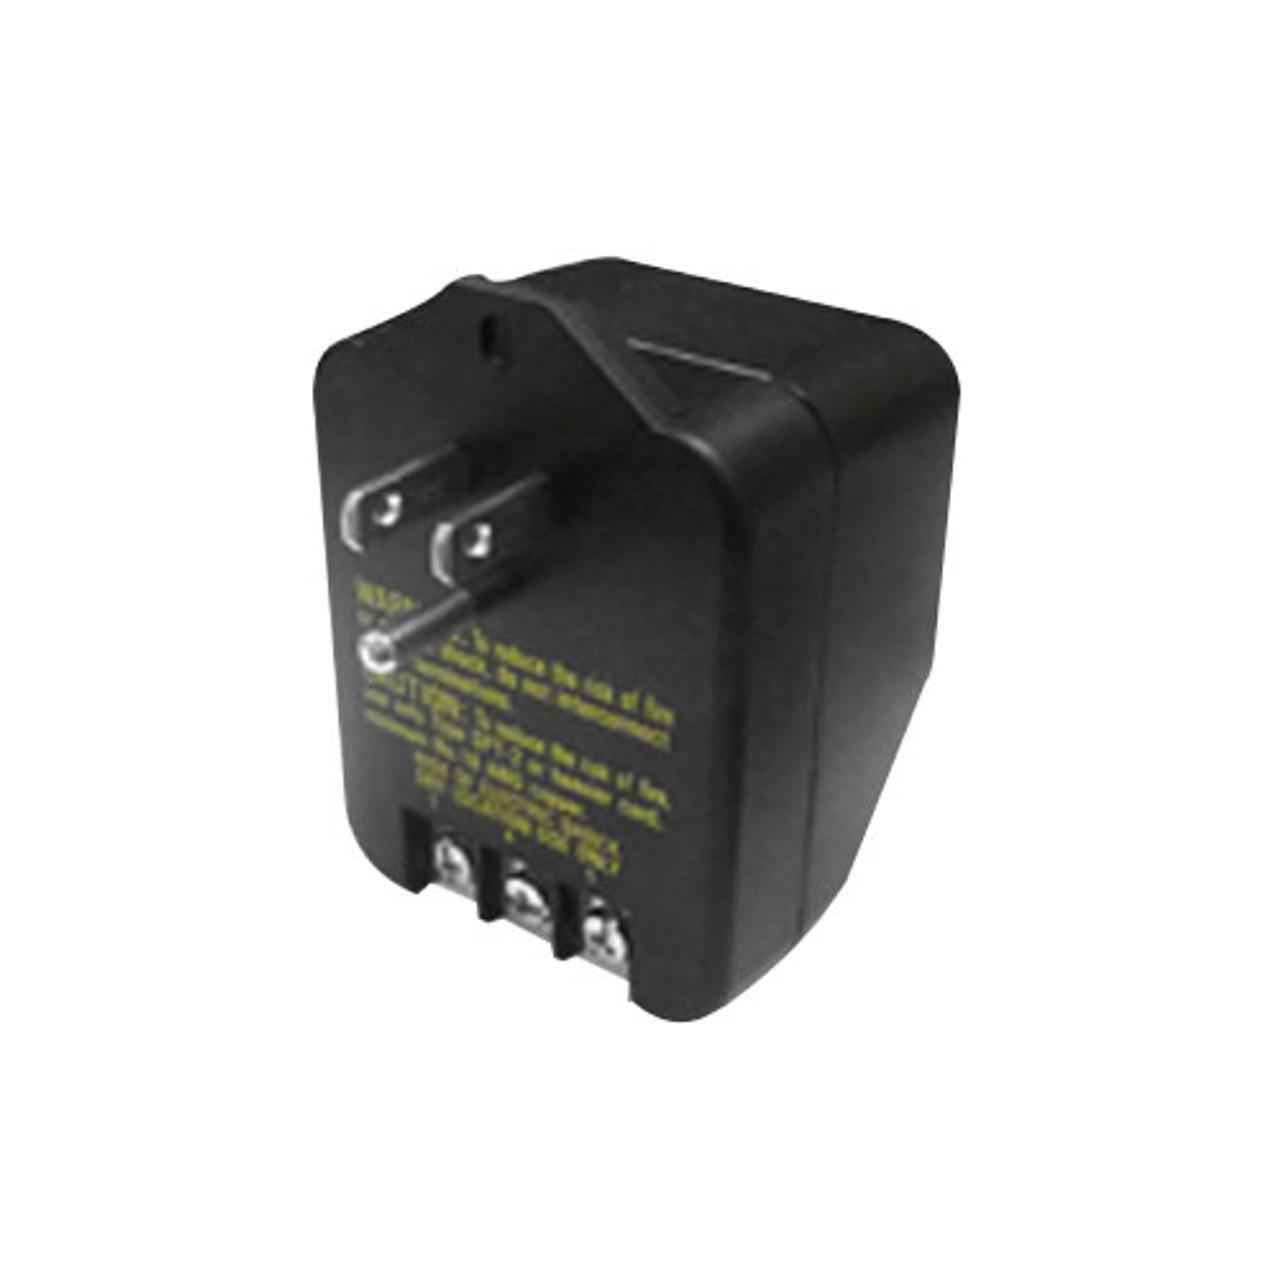 5205 Trine Plug in Type Tri Volt AC Transformer